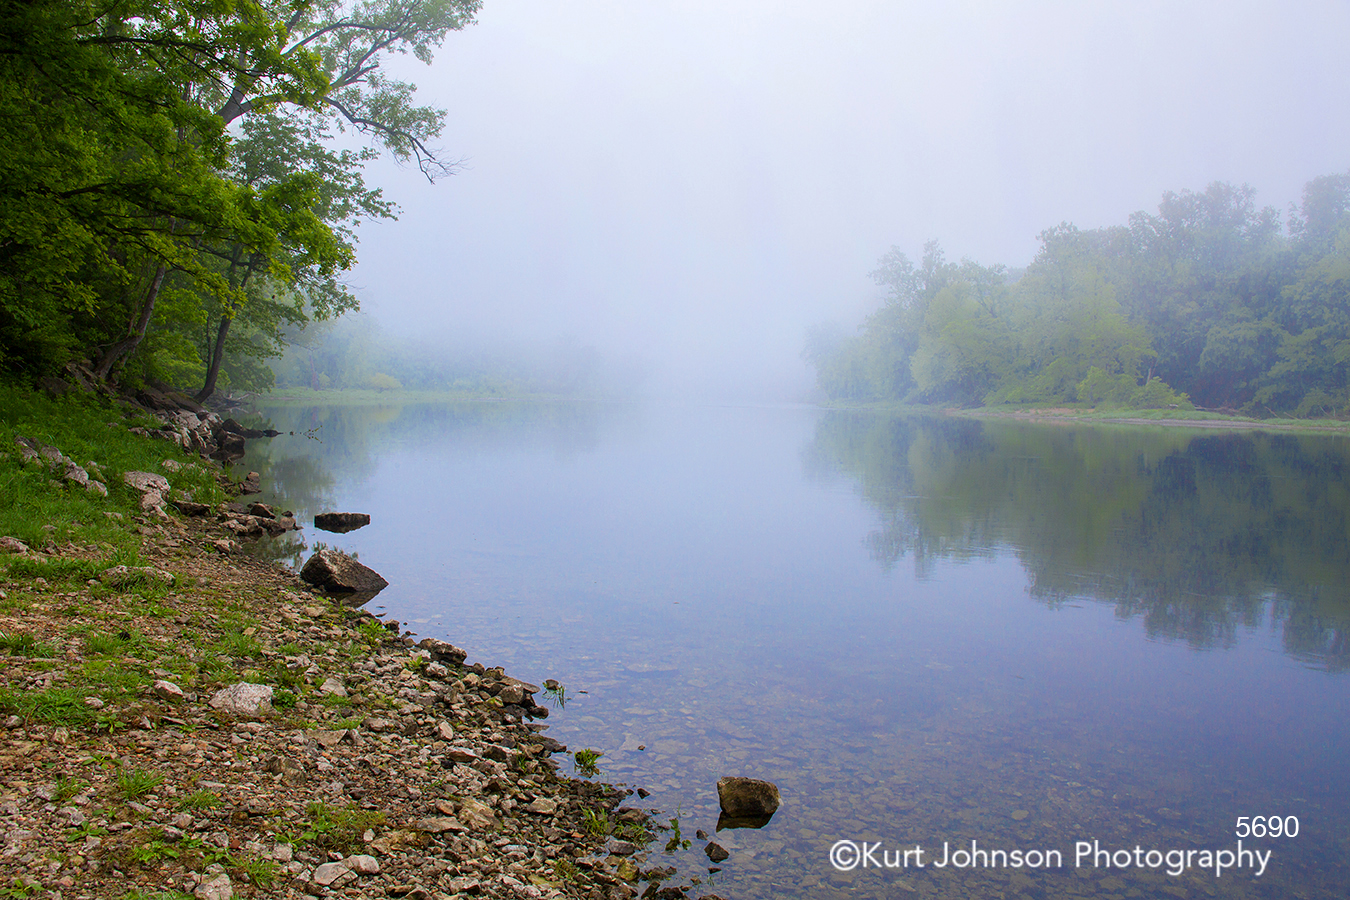 fog calm still water waterscape stream rocks shore green trees